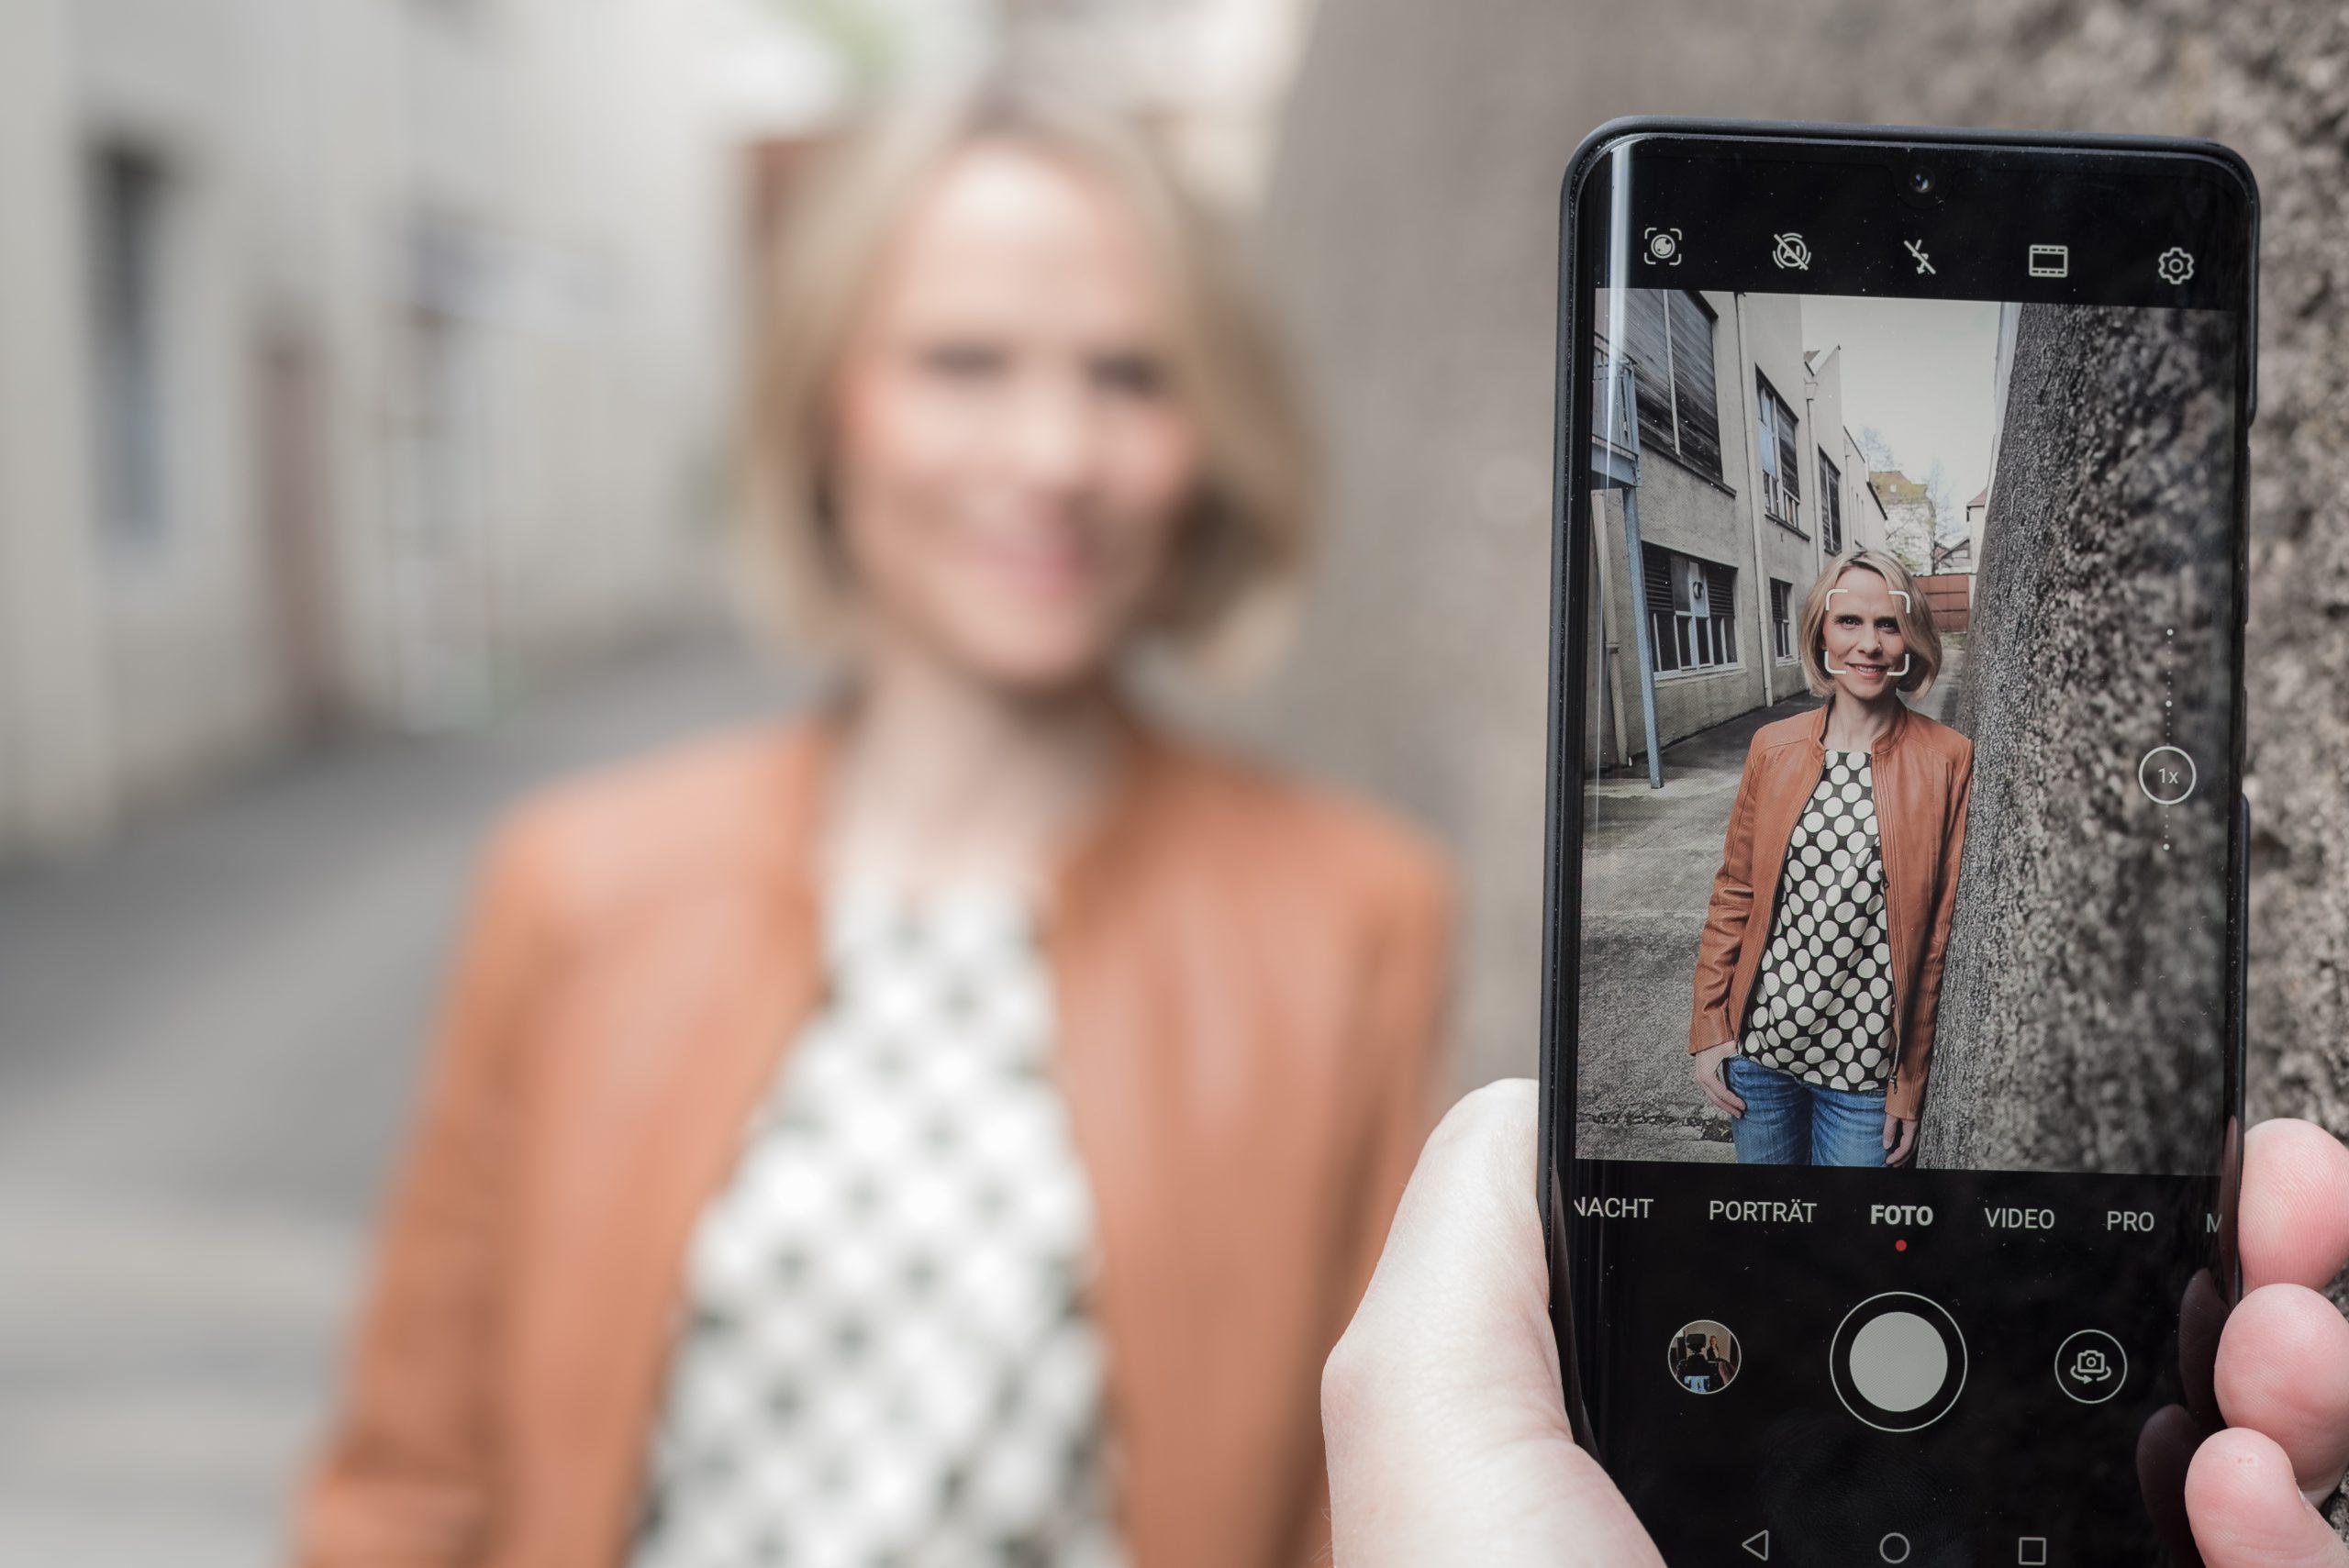 Kösler Fotografie Handy Fotokurs Portrait Esslingen